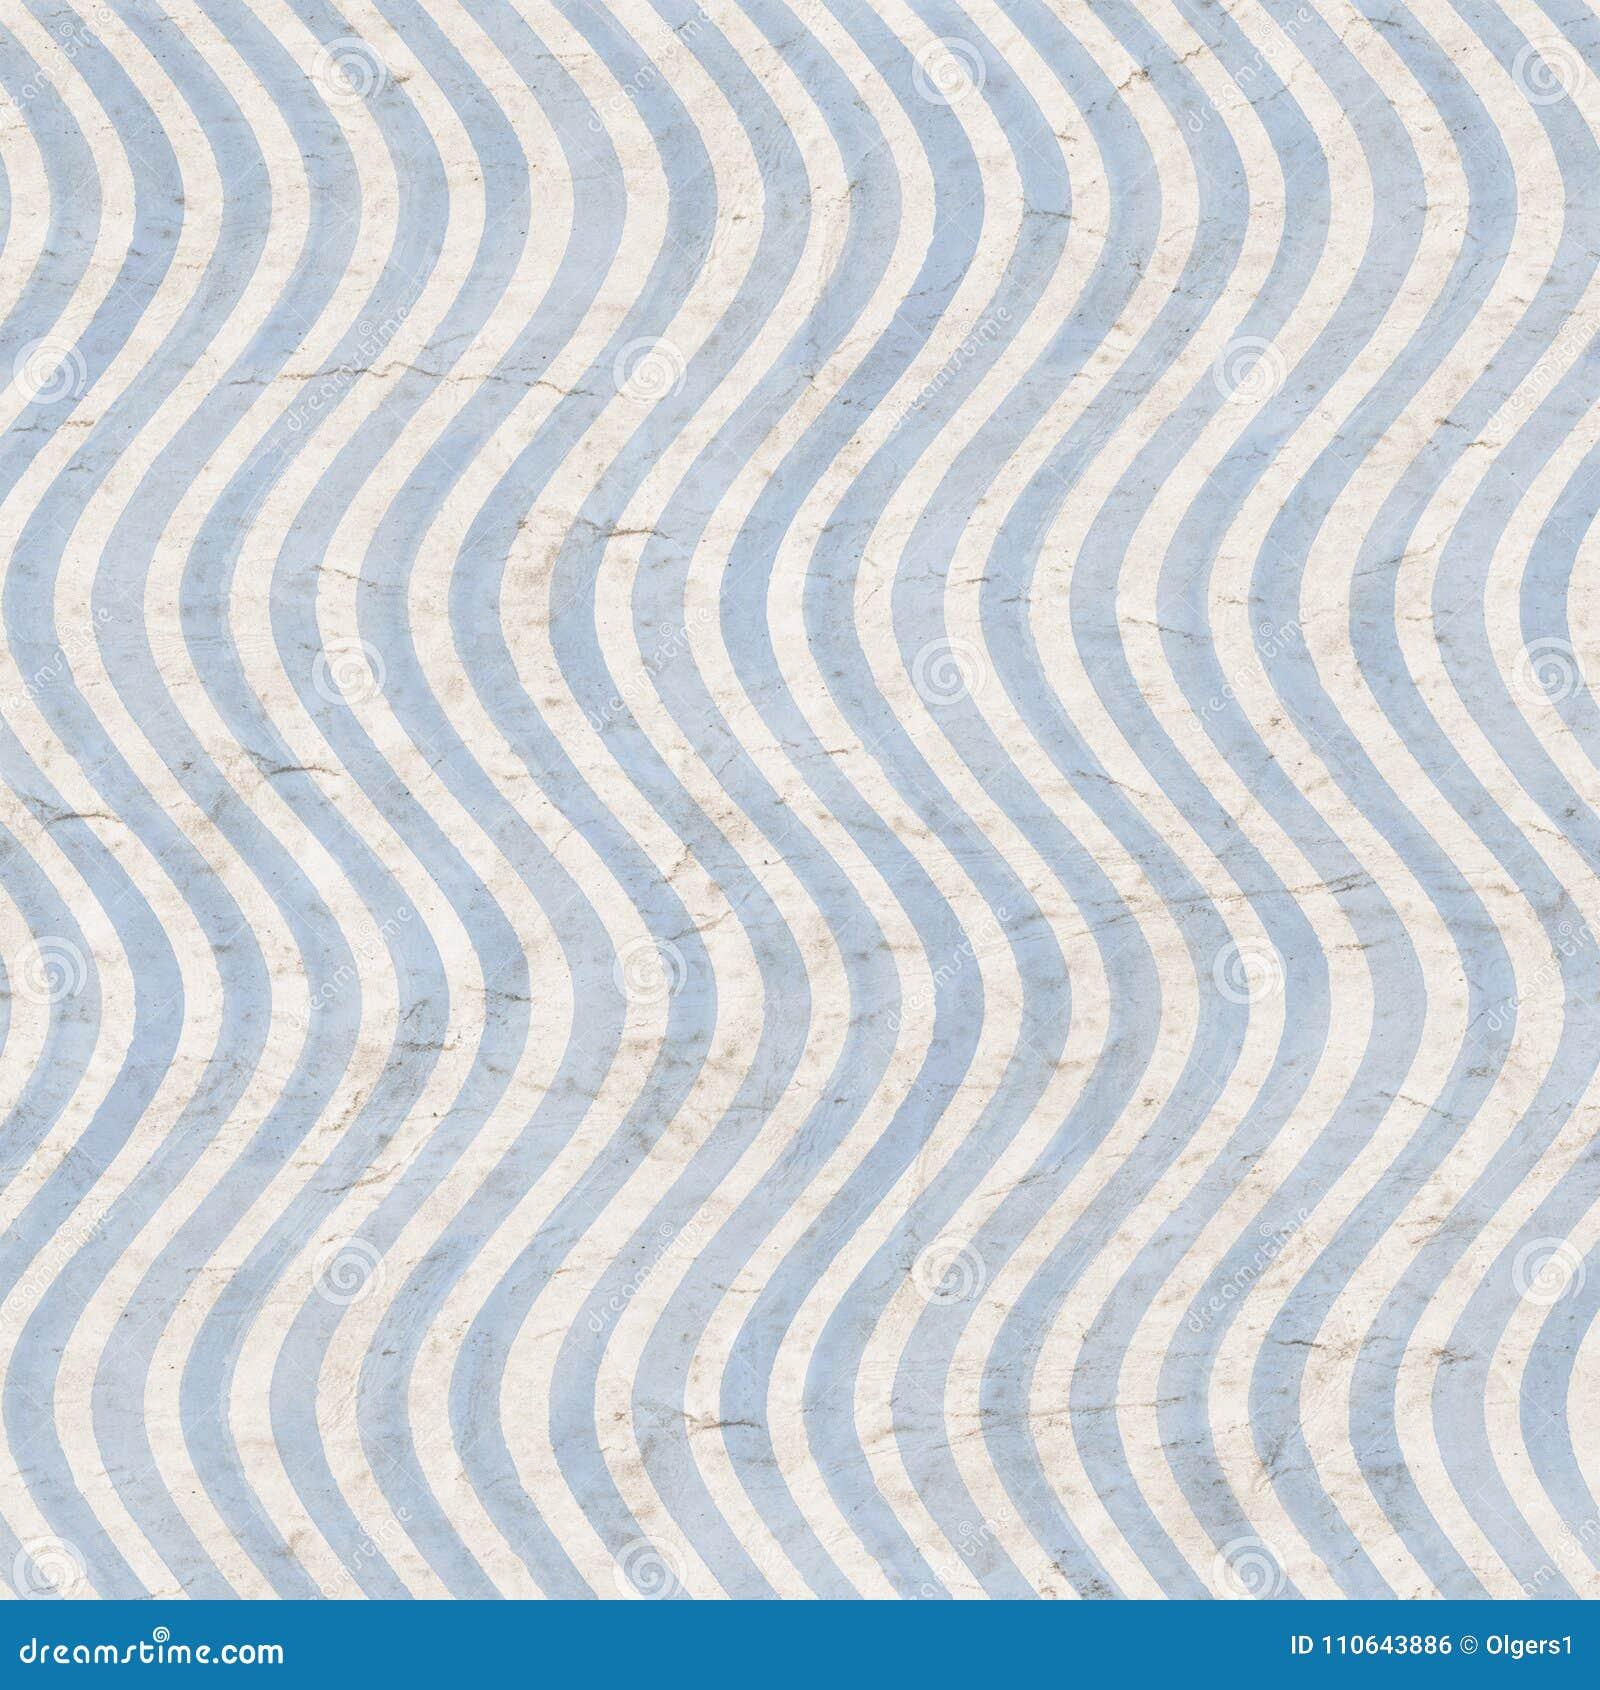 Vintage stripe background. Seamless pattern